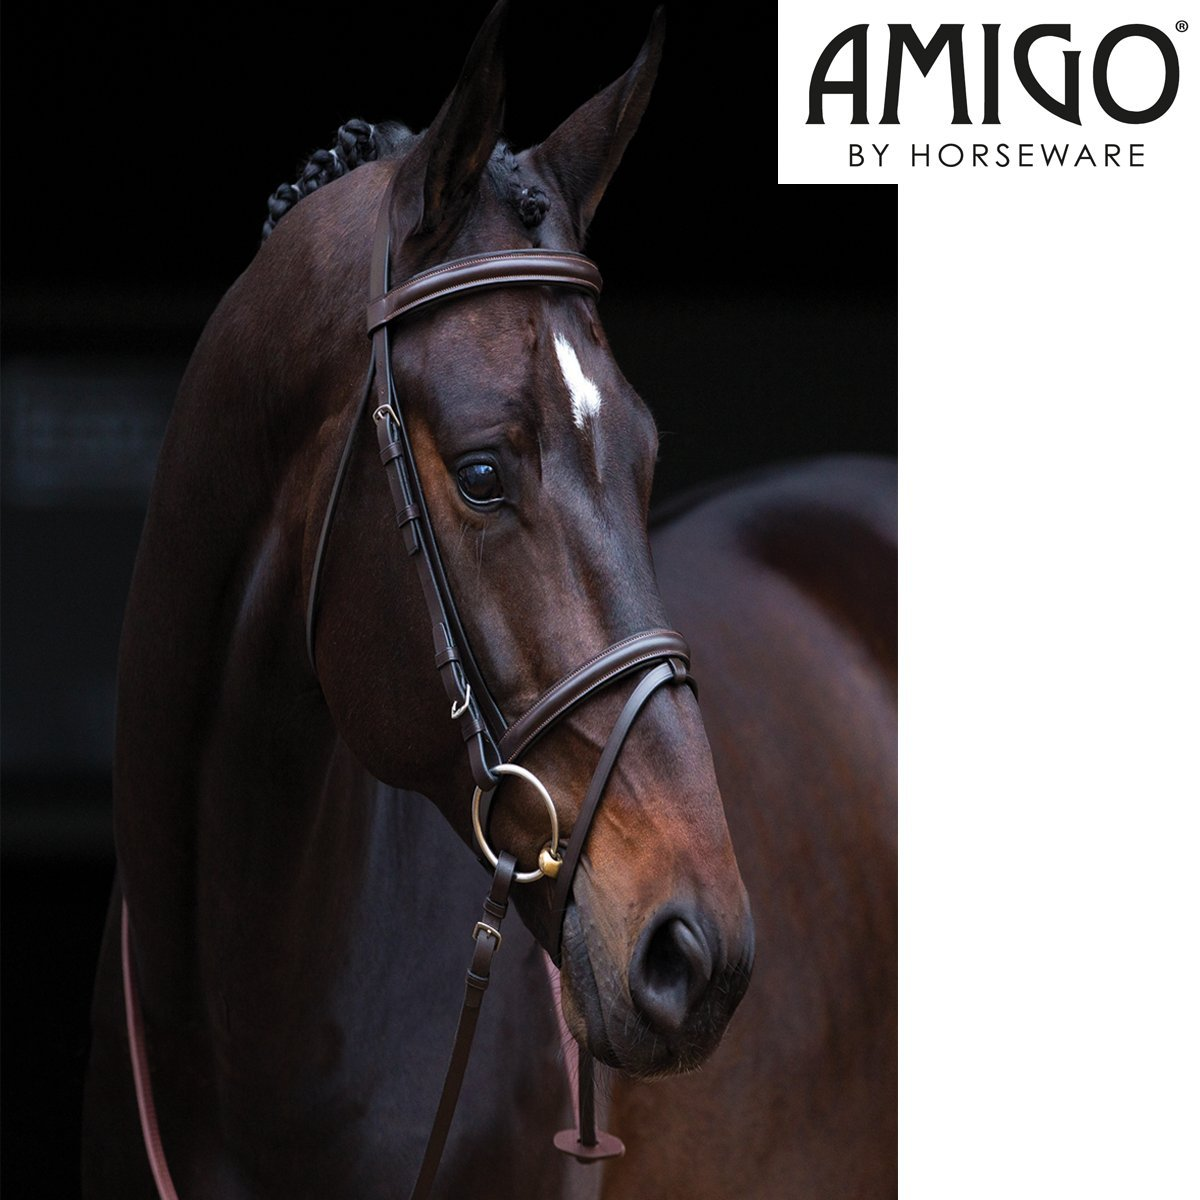 Horseware Amigo Flash Bridle with Rubber Grip Reins black pony